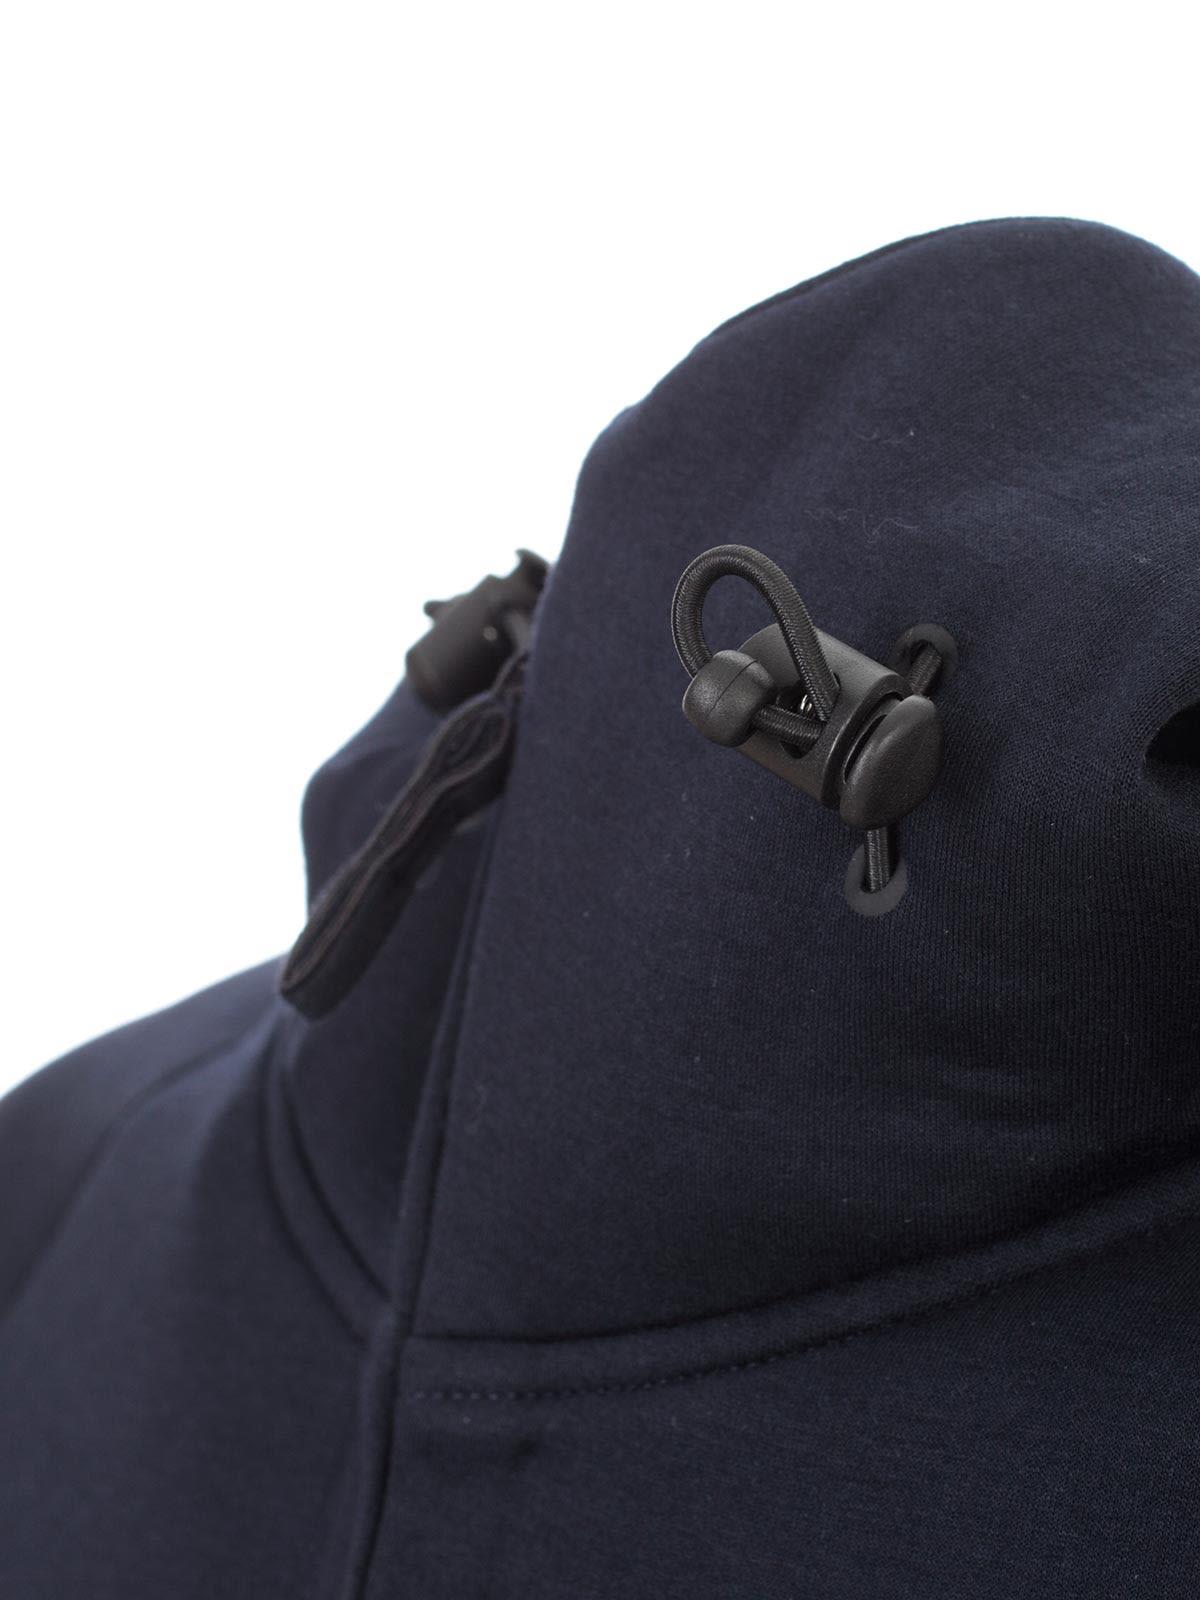 Best Price Aspesi Sweatshirt Jersey - Top Quality